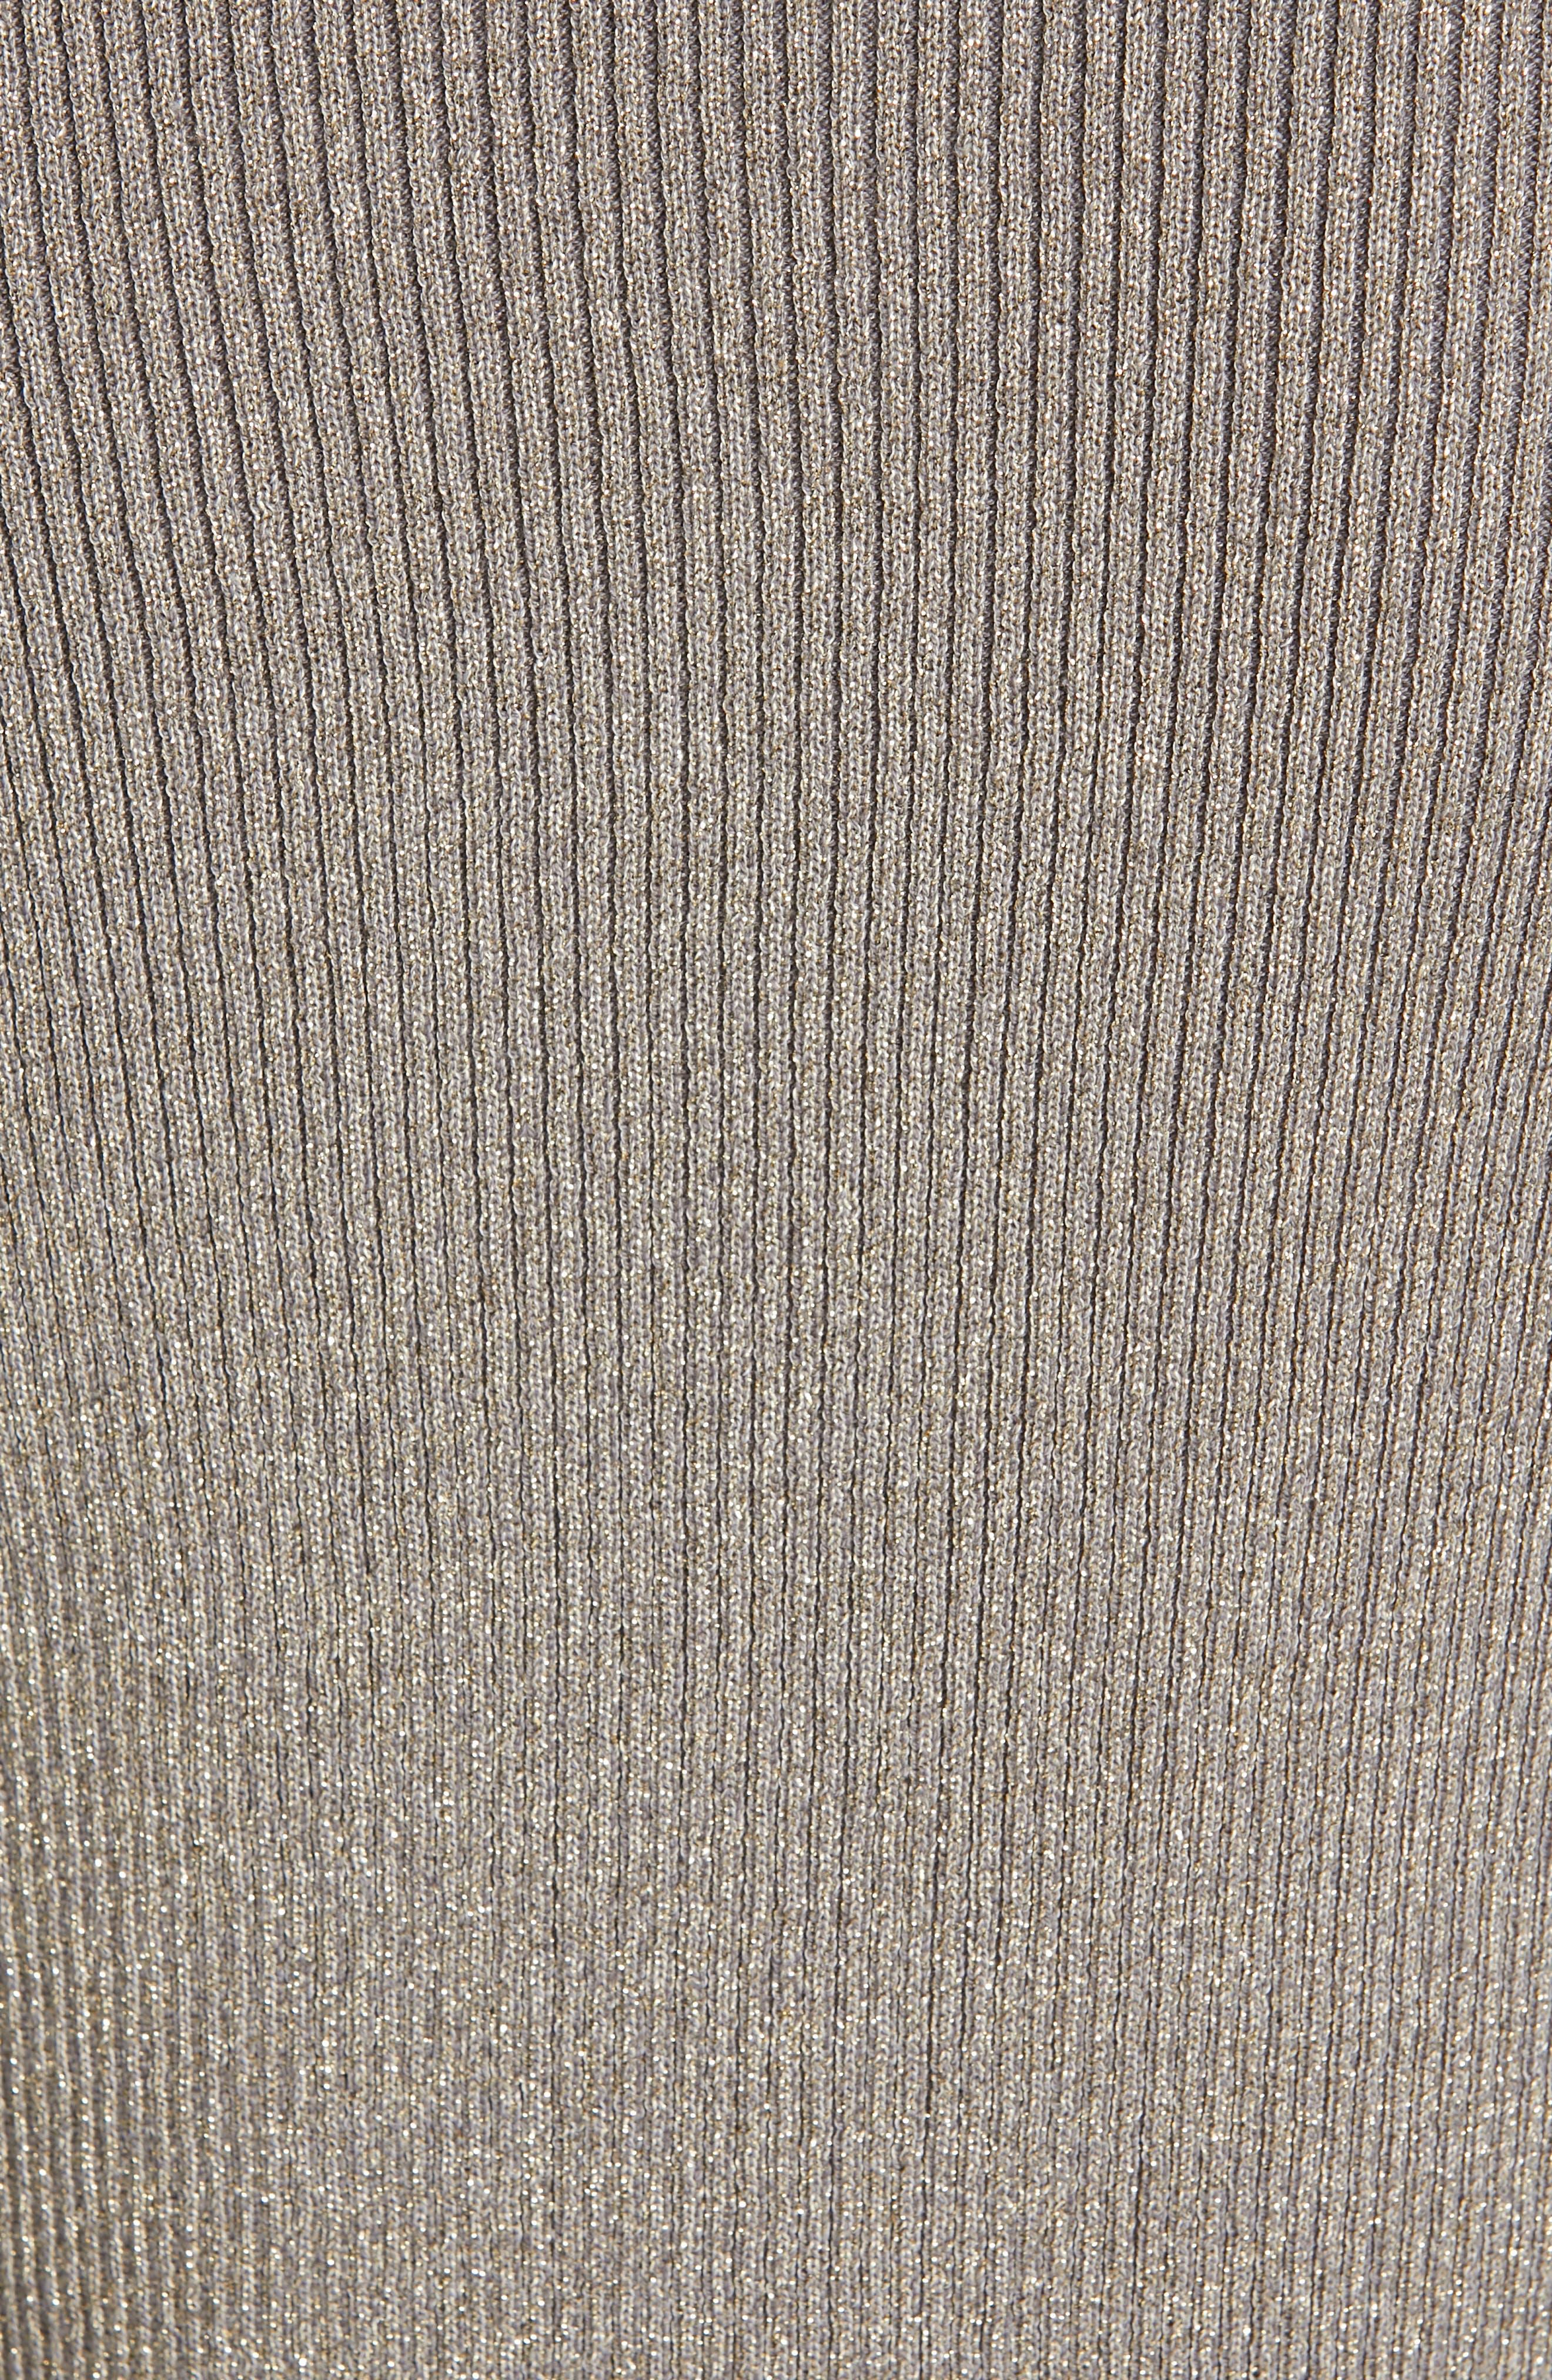 Saaydie Bow Trim Metallic Sweater,                             Alternate thumbnail 5, color,                             CHARCOAL